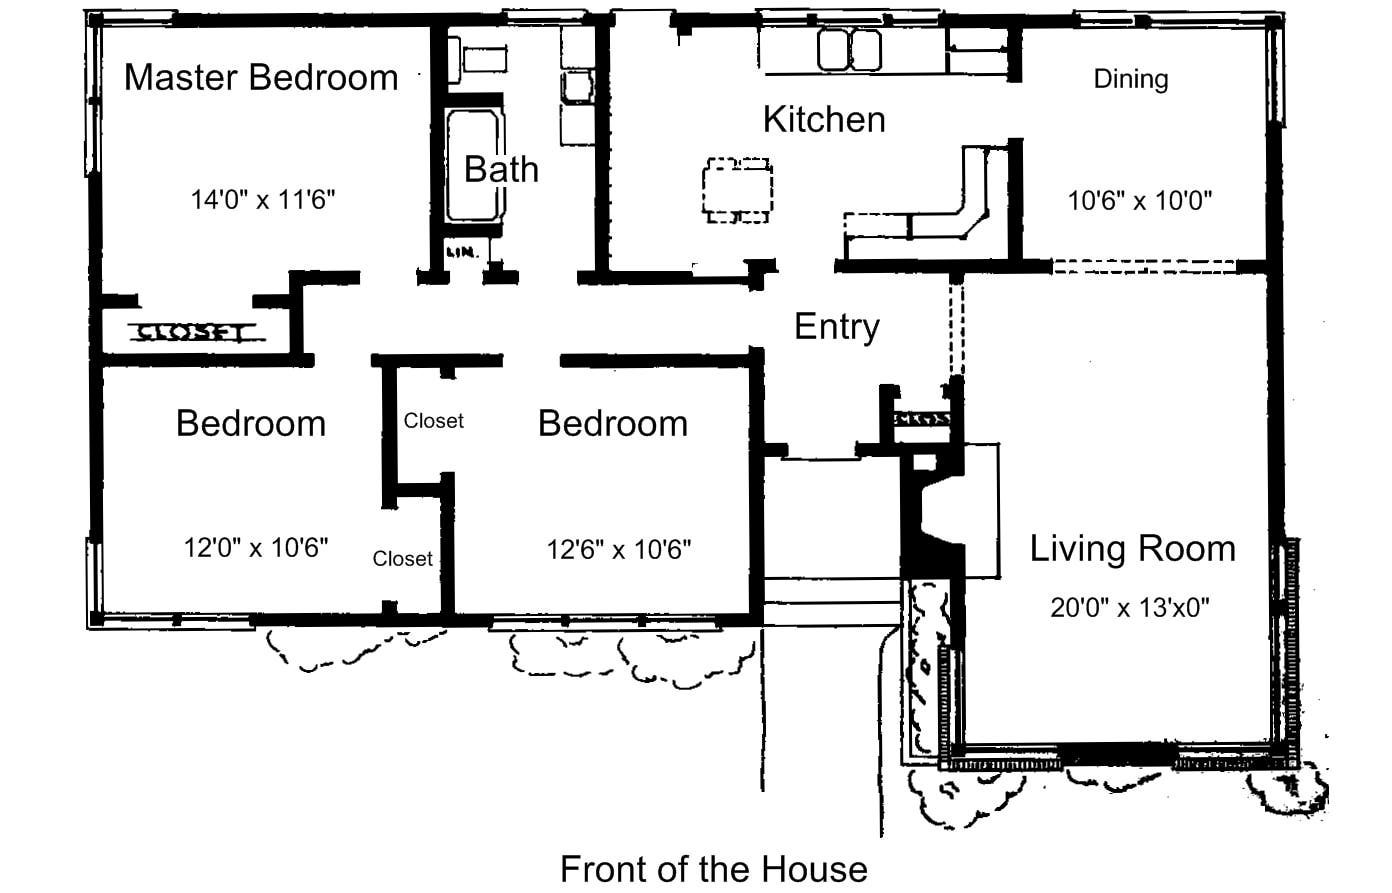 Superb 3 Bedroom Apartmenthouse Plans Cheap 3 Bedroom House Plans 3 Largest Home Design Picture Inspirations Pitcheantrous